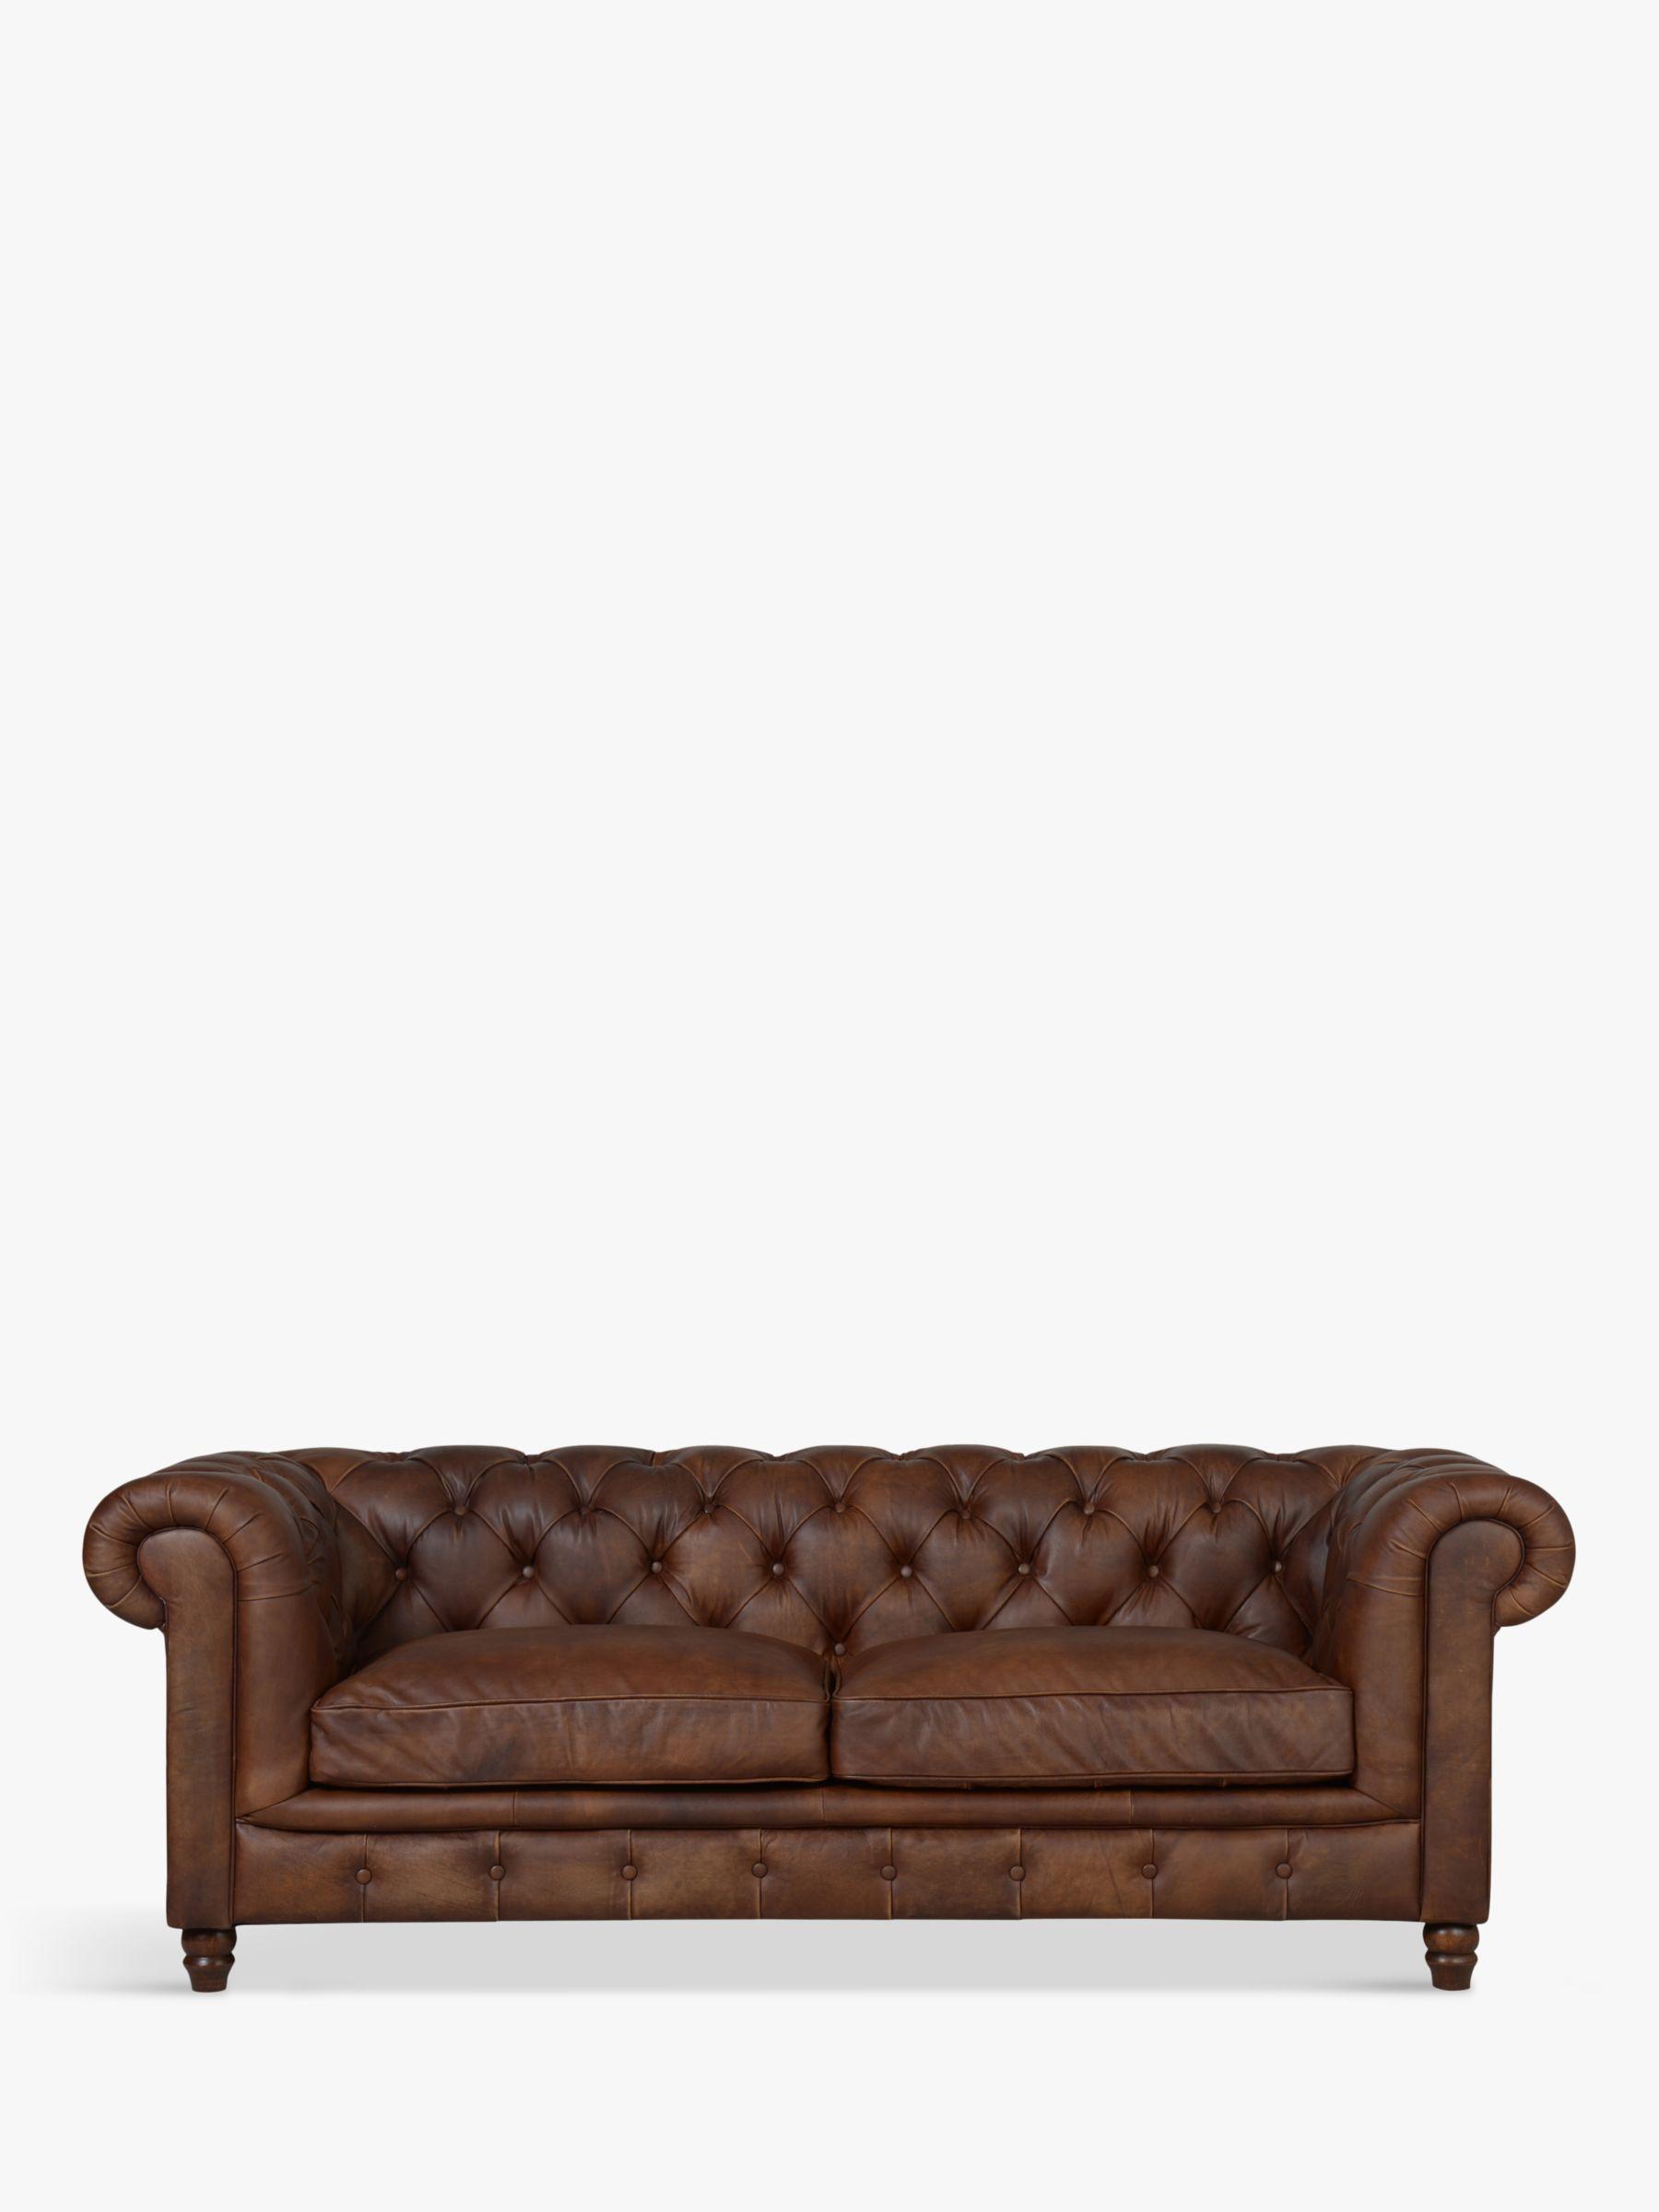 Halo Halo Earle Aniline Leather Chesterfield Medium Sofa, Antique Whisky